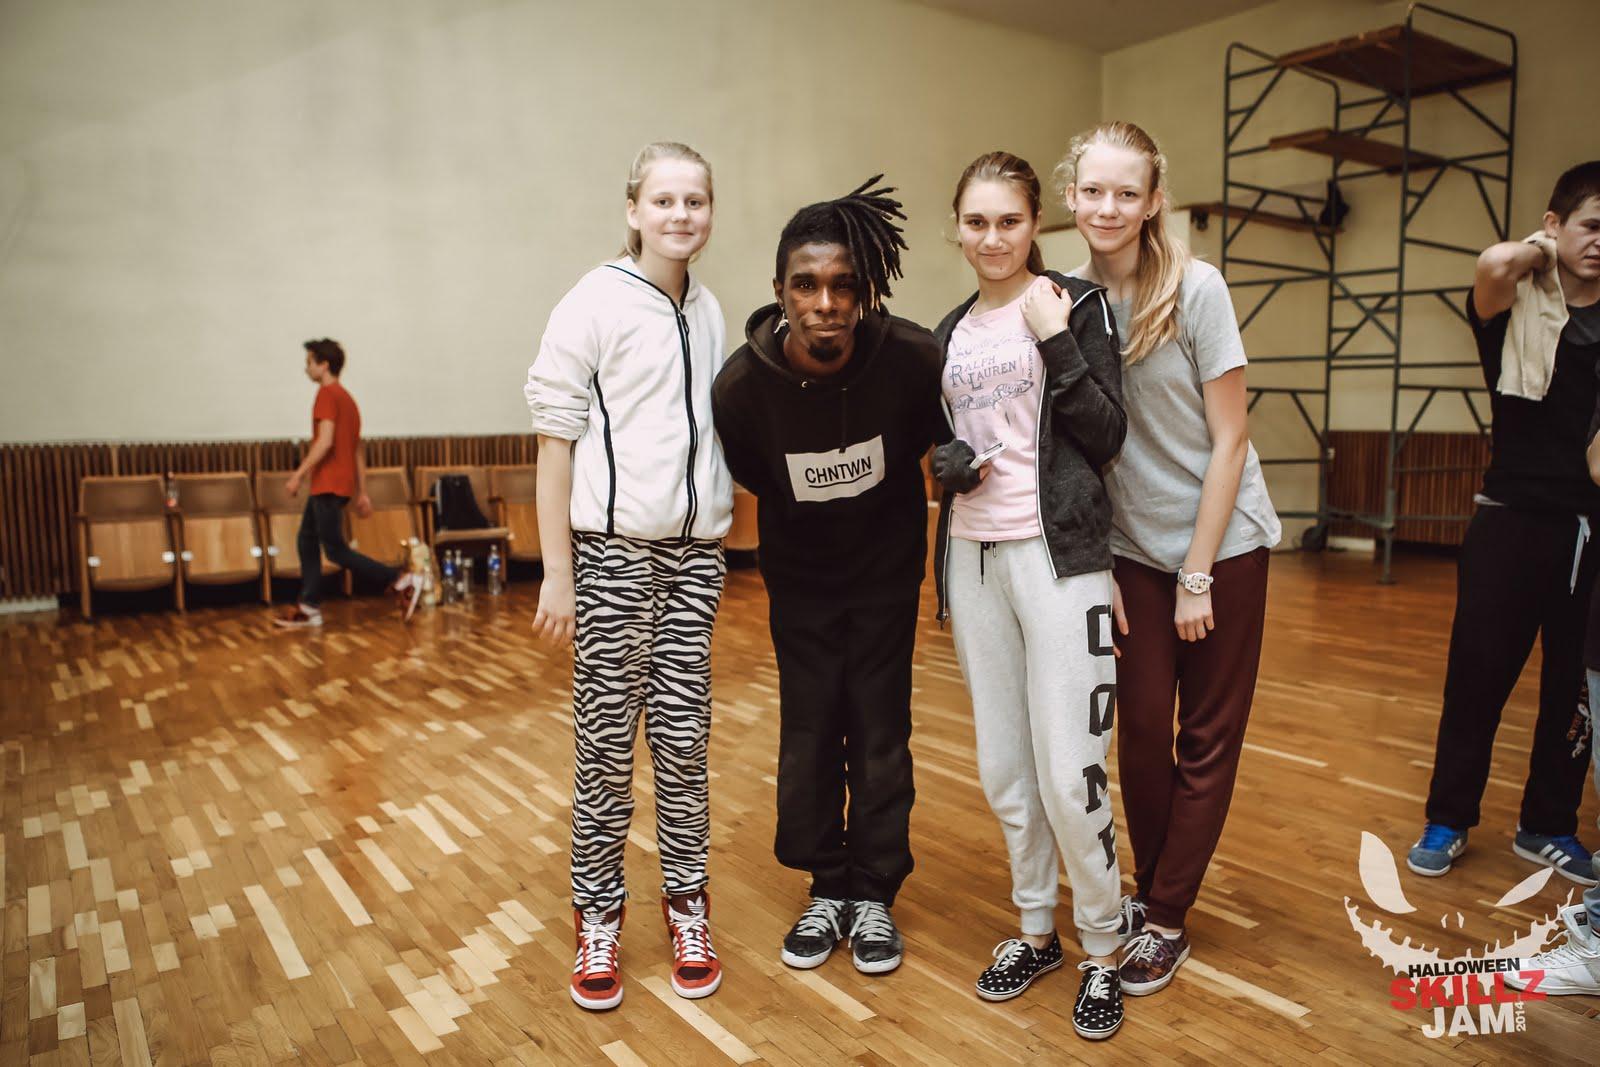 Šokių seminarai su Bouboo, Kaczorex, Tanya, Marek - _MG_7315.jpg